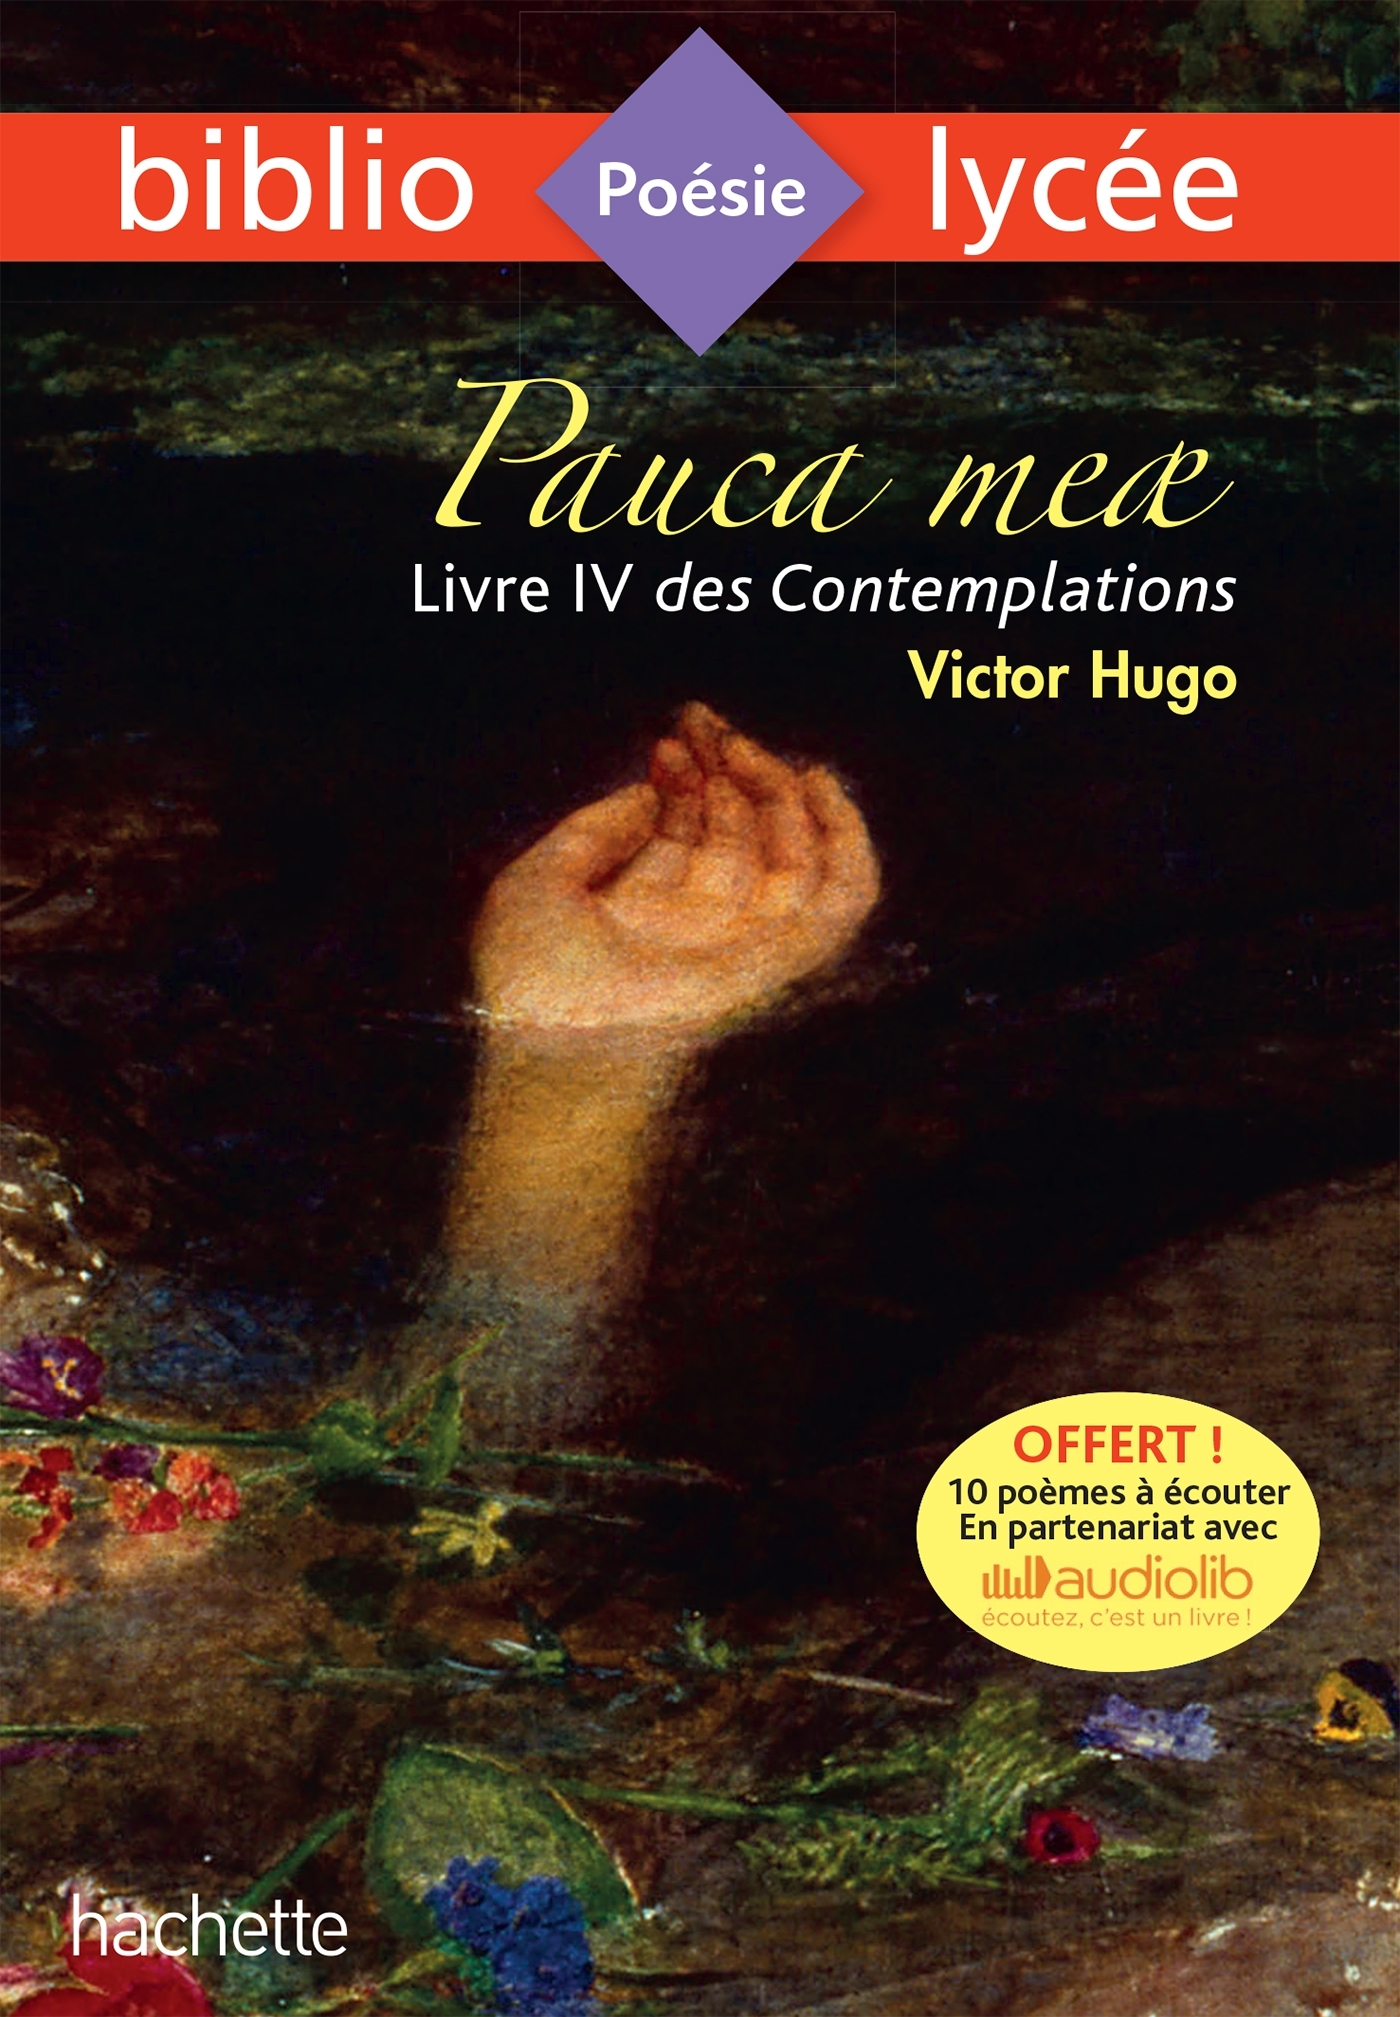 BIBLIOLYCEE - PAUCA MEAE (LIVRE IV DES CONTEMPLATIONS, VICTOR HUGO